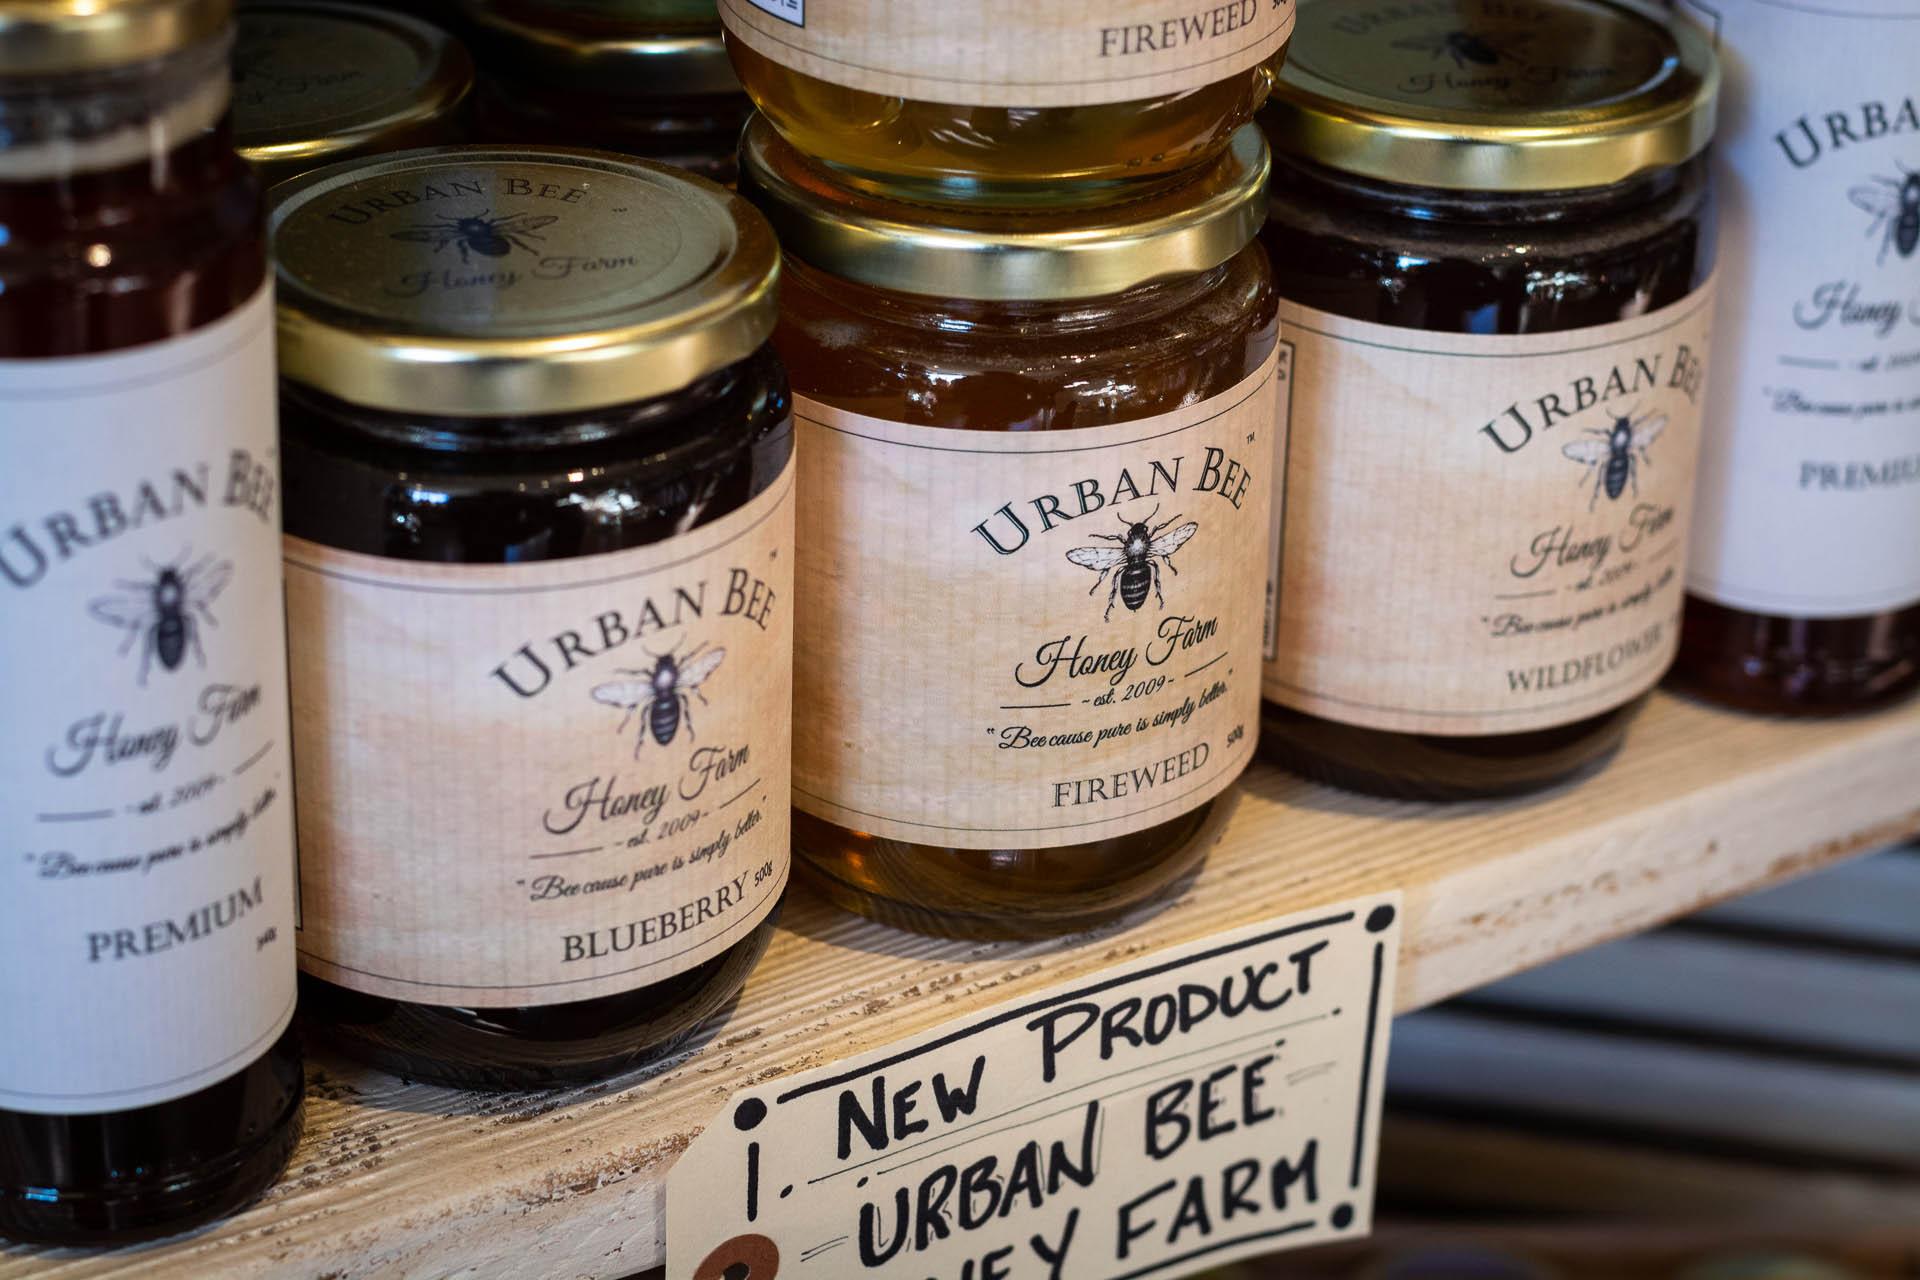 Urban Bee Honey Farm